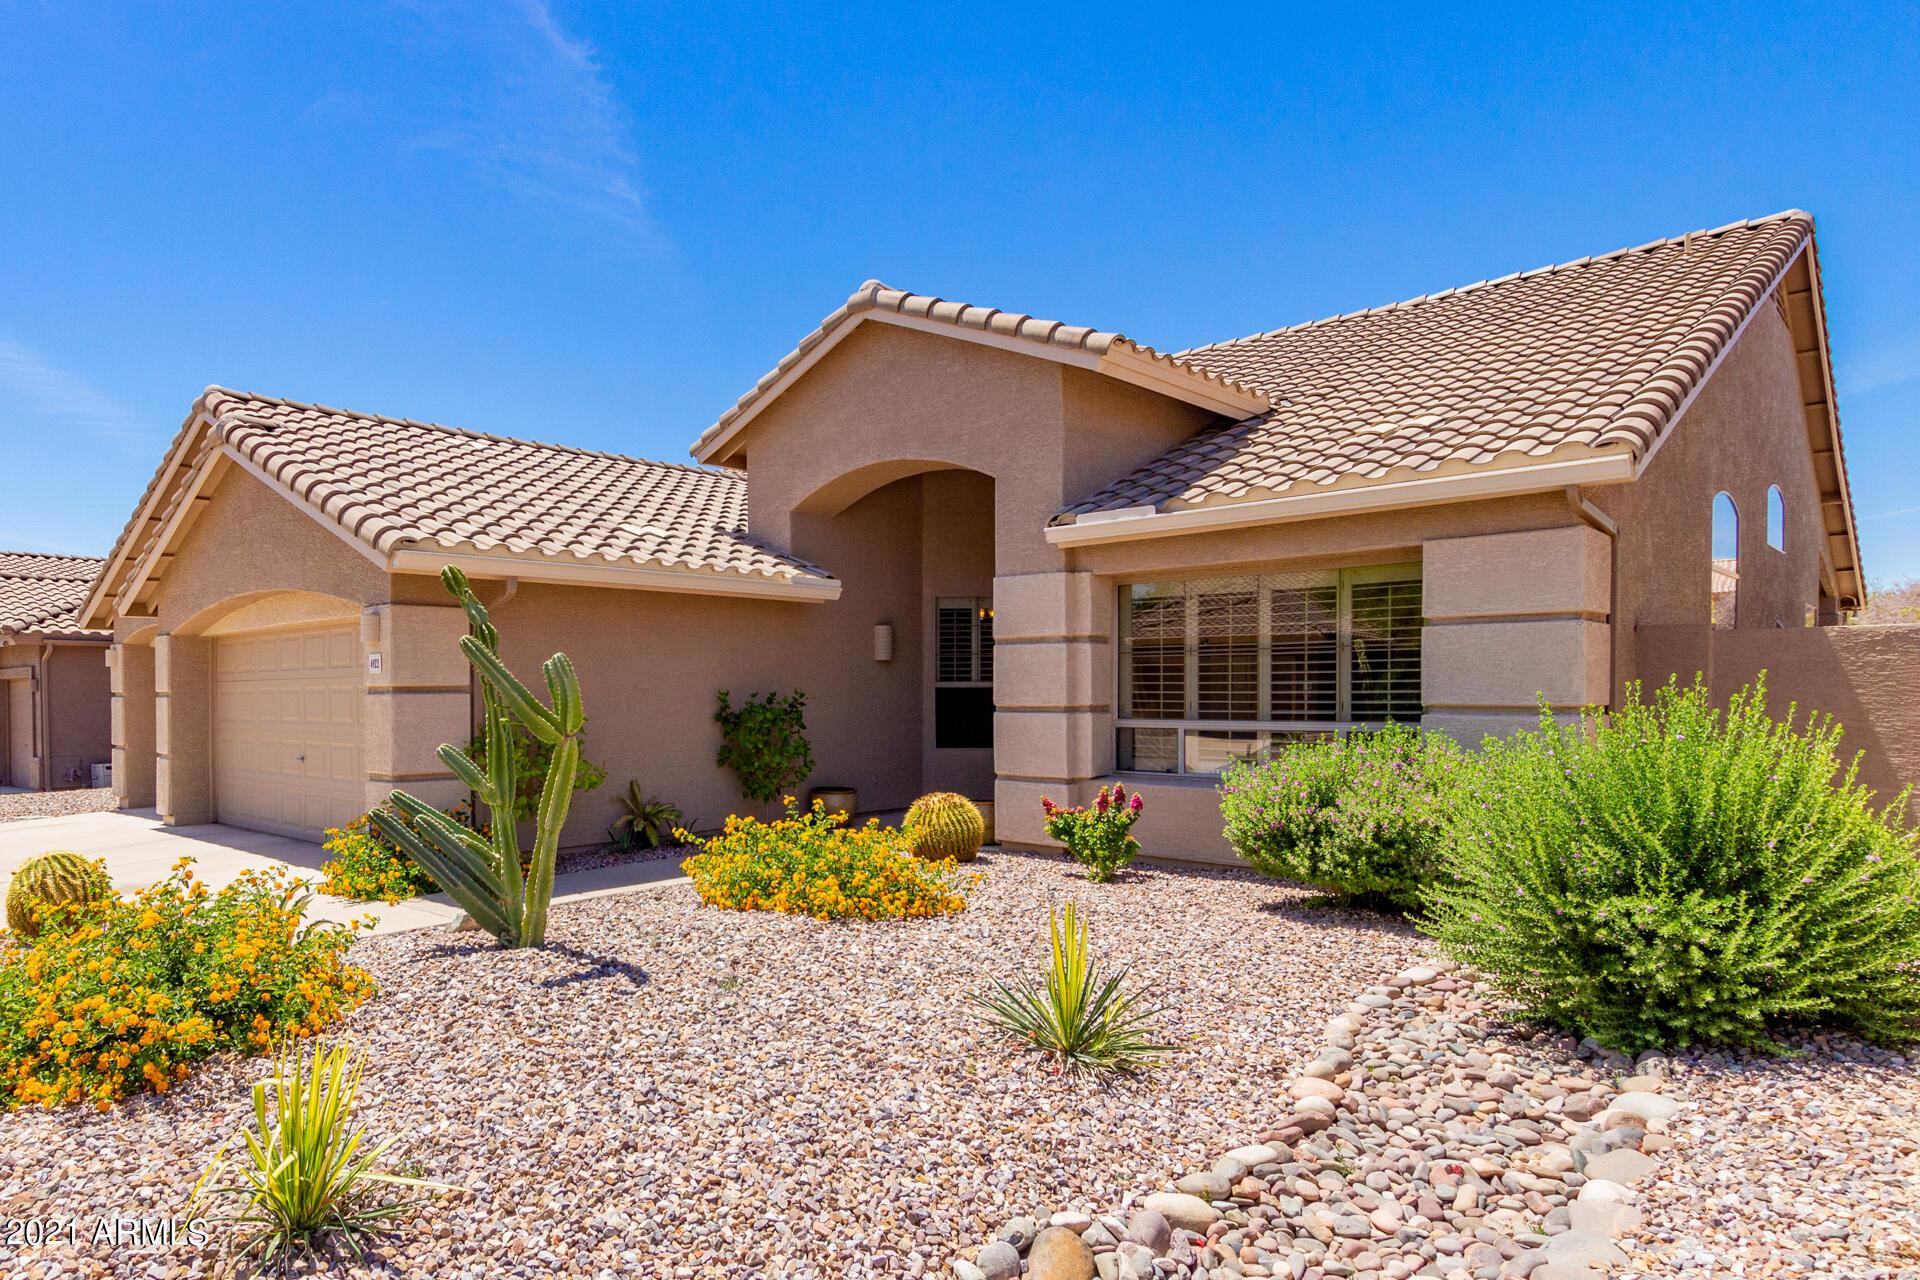 4922 DUANE Lane, Cave Creek, Arizona 85331, 4 Bedrooms Bedrooms, ,2 BathroomsBathrooms,Residential,For Sale,DUANE,6234197